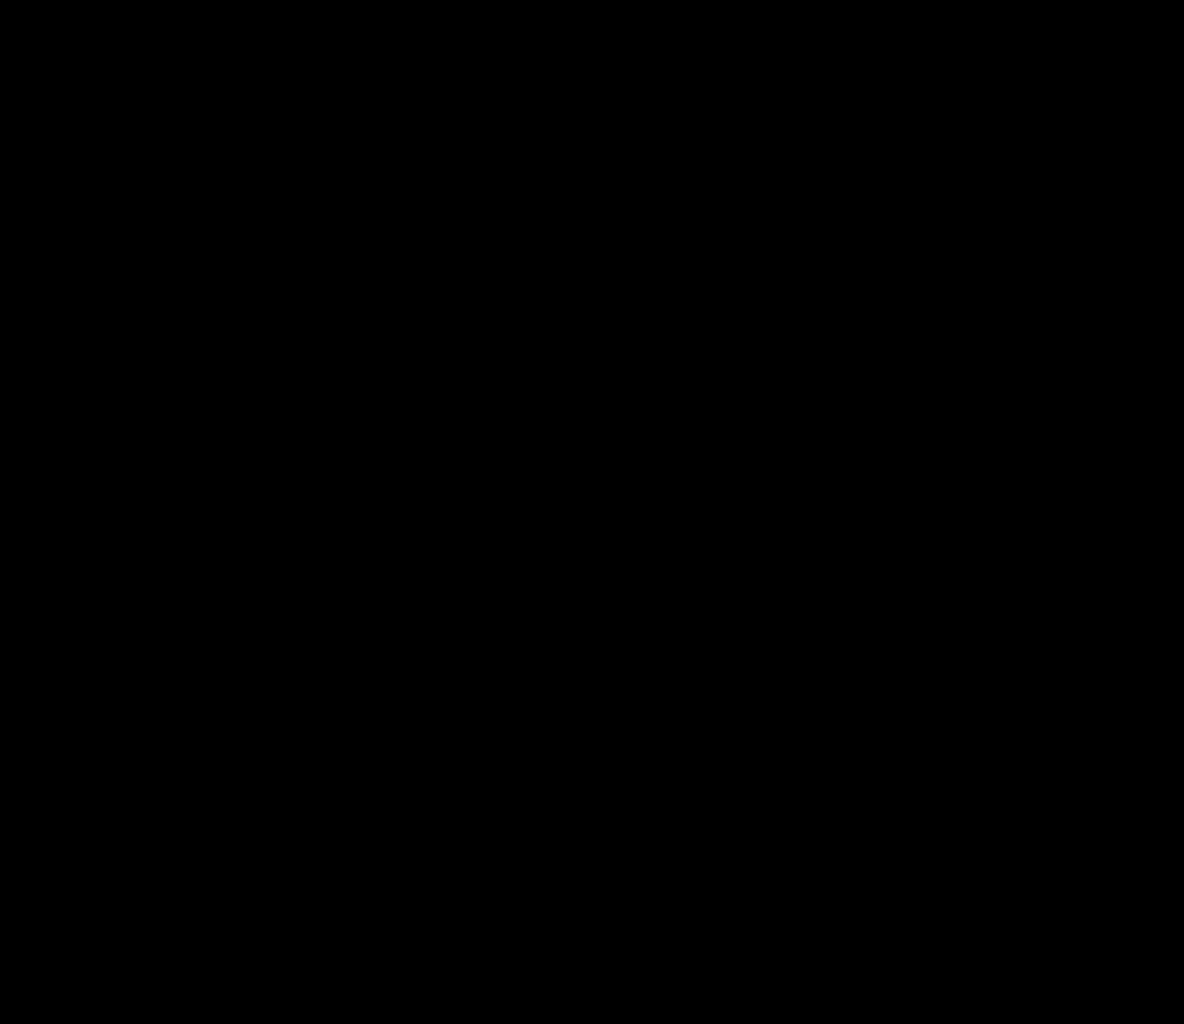 Hexagon Png - Hexagon Shape, Transparent background PNG HD thumbnail